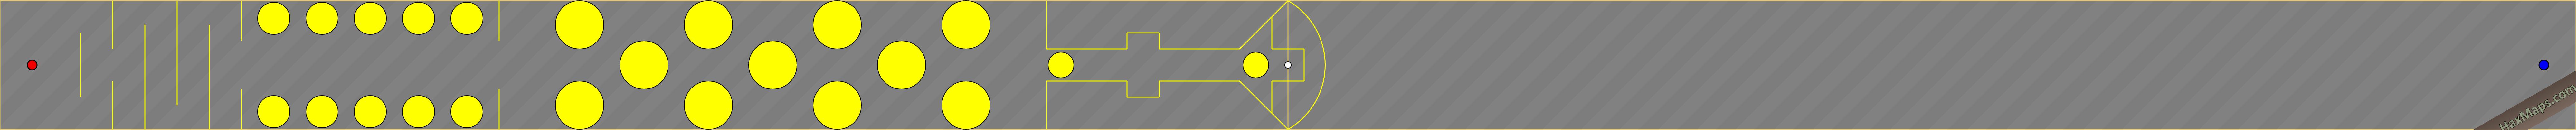 hax ball maps   Yellow Beginner by Galactic Boy